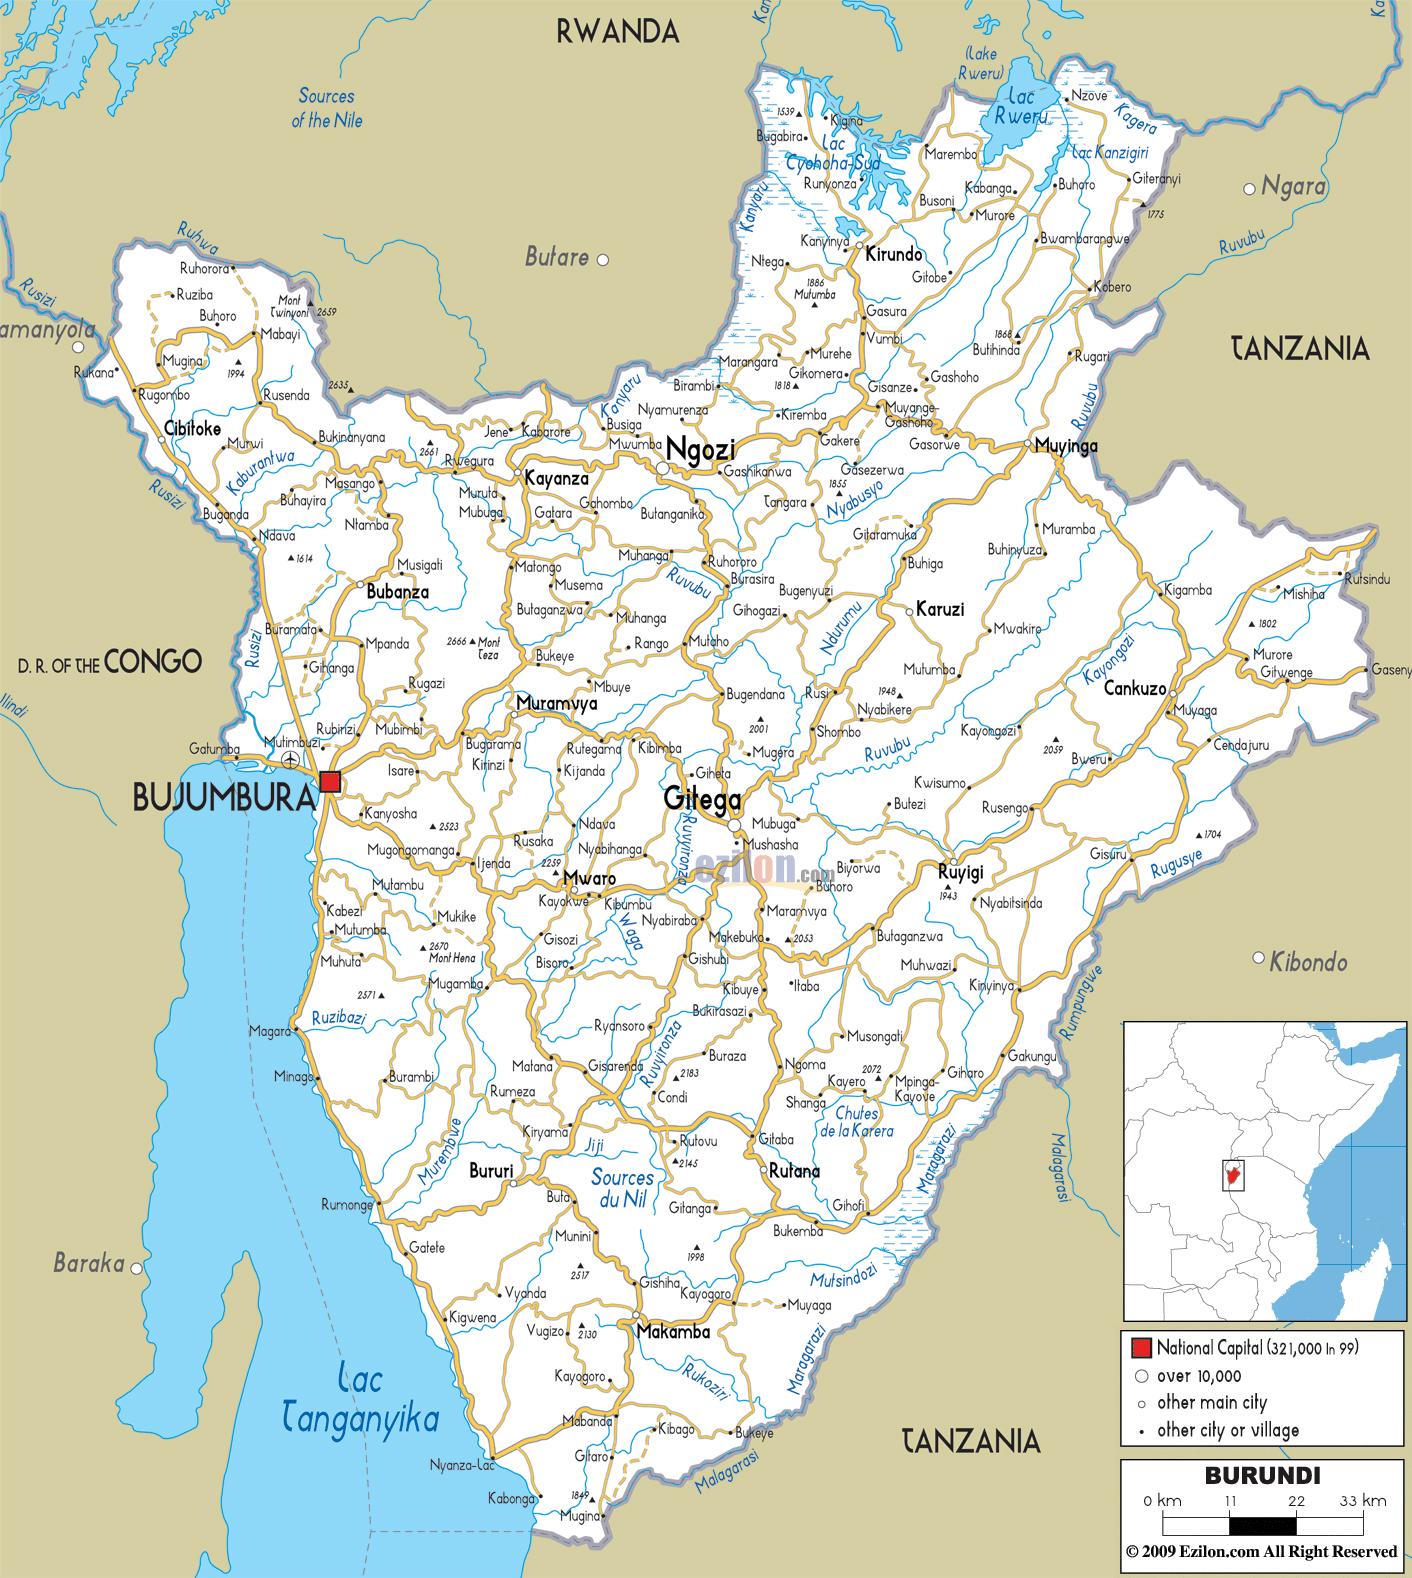 Large Road Map Of Burundi With Cities And Airports Burundi - Where is burundi on a world map